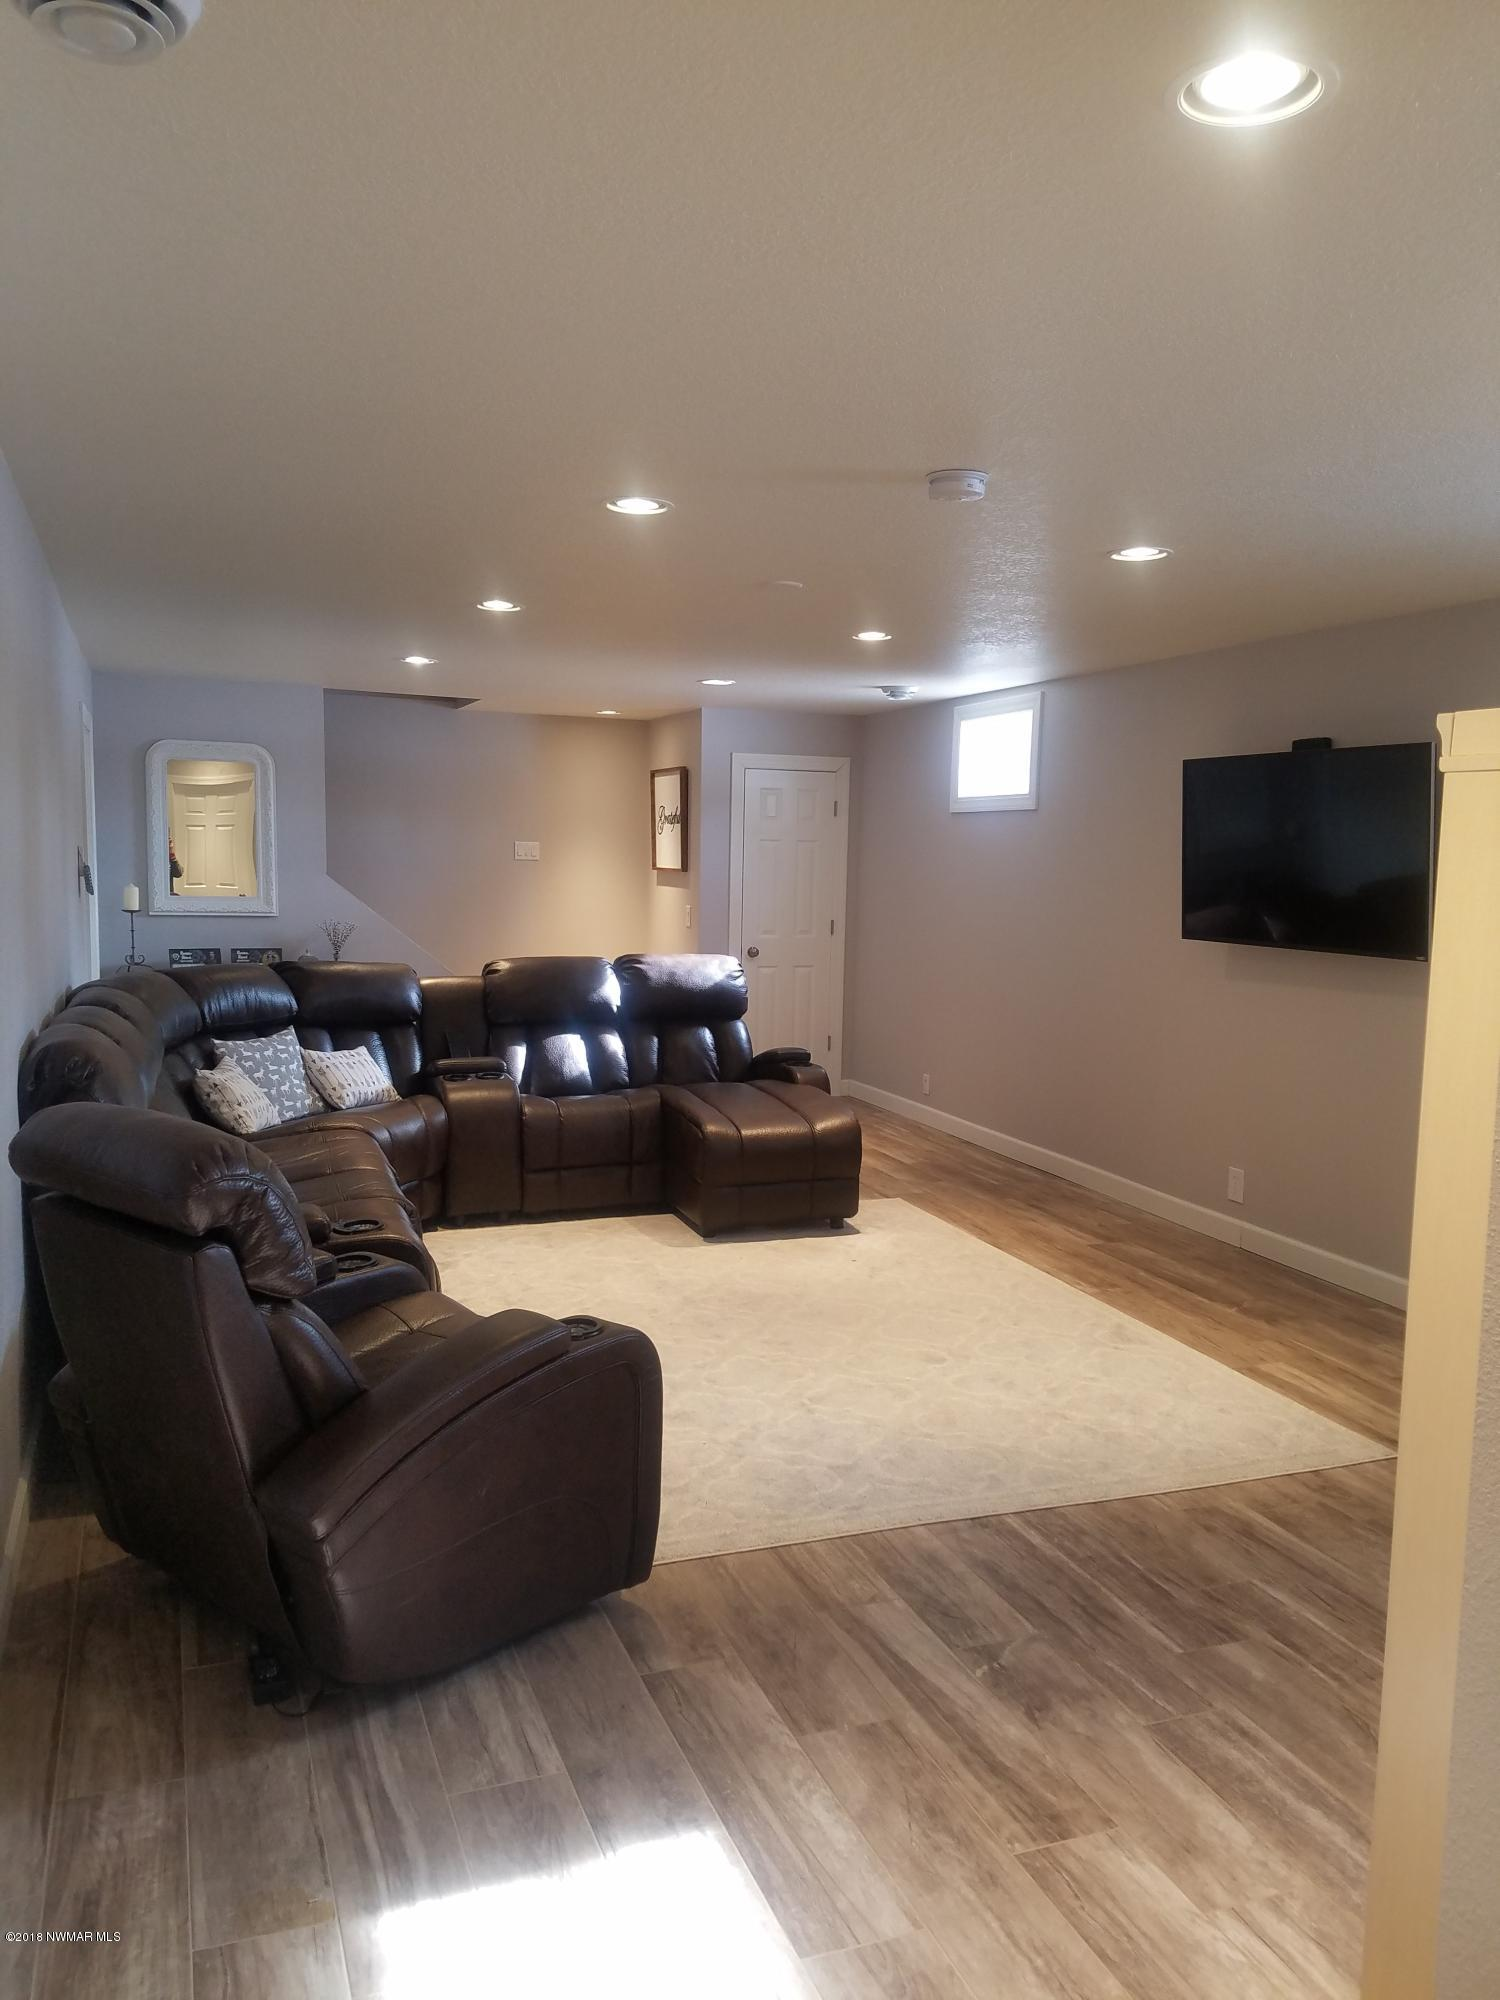 Basement Living Room - View 2